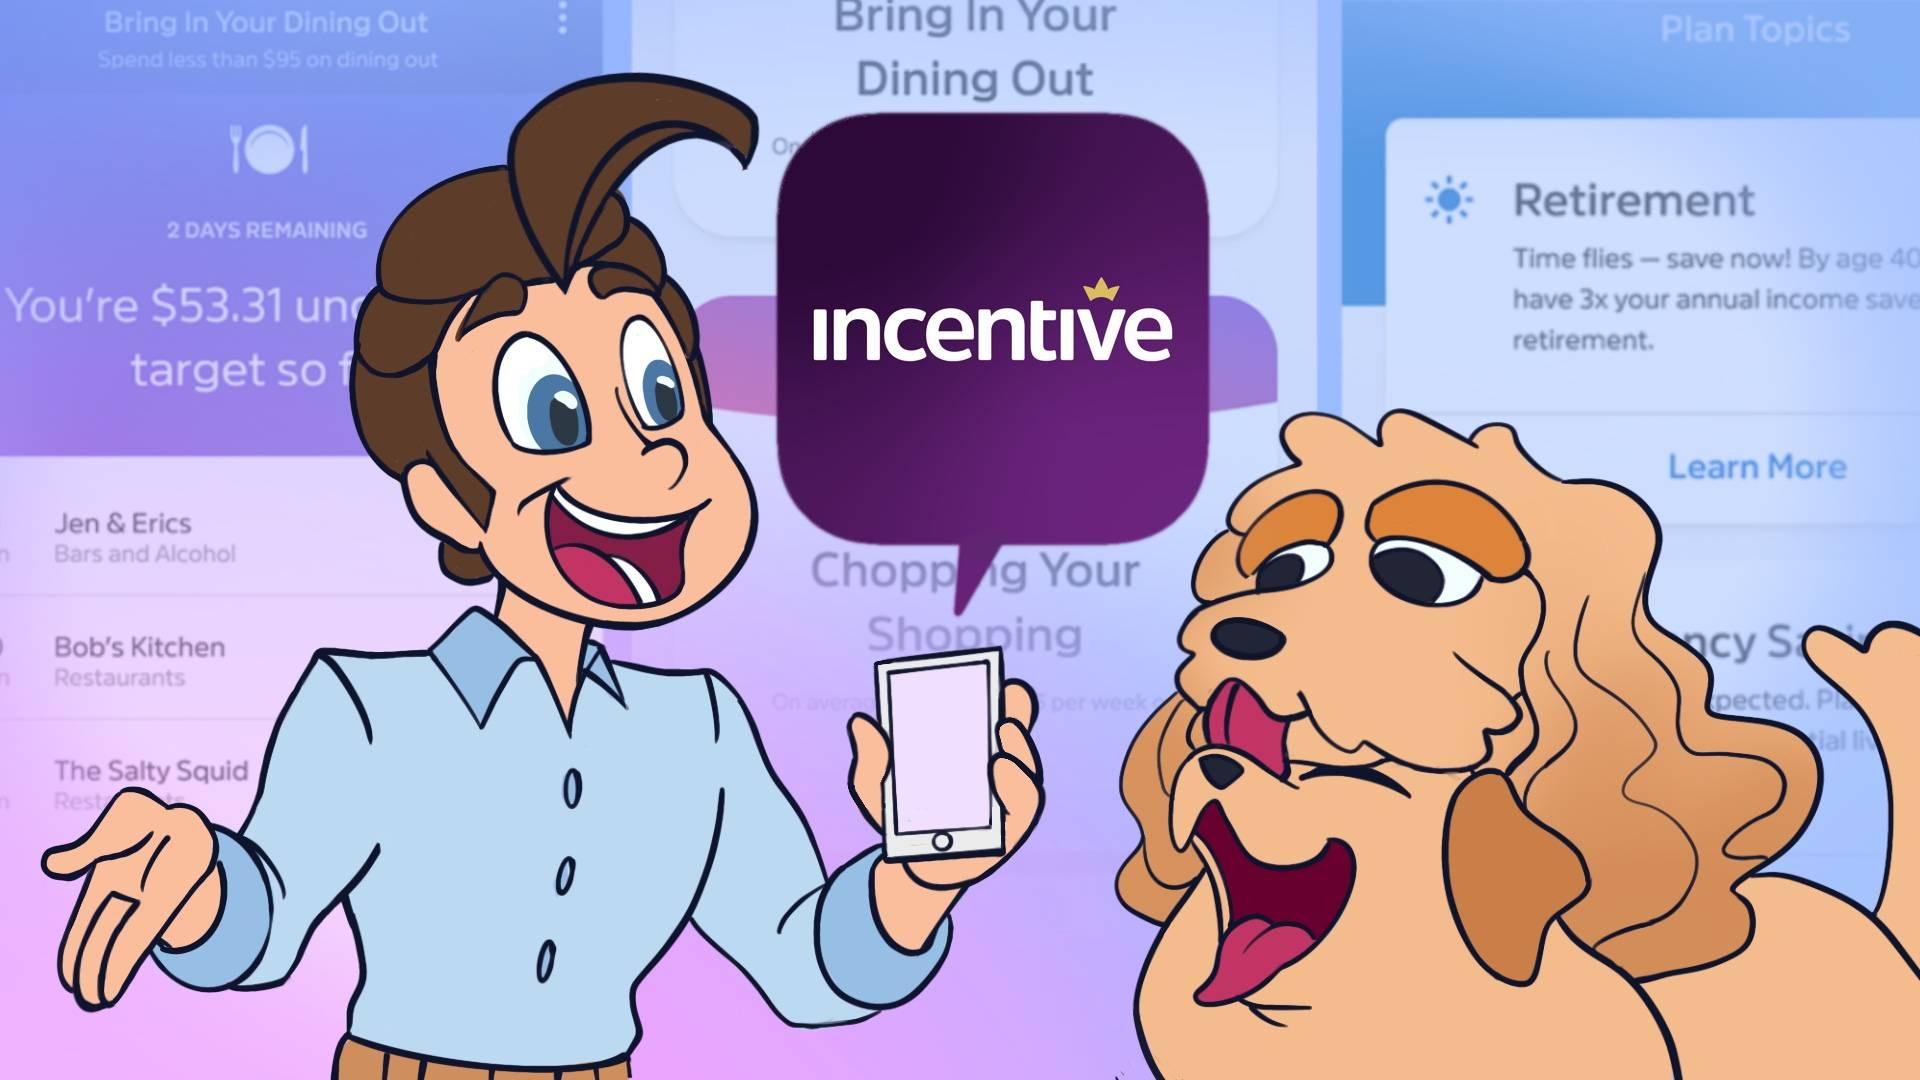 Dan Talks About the Incentive App